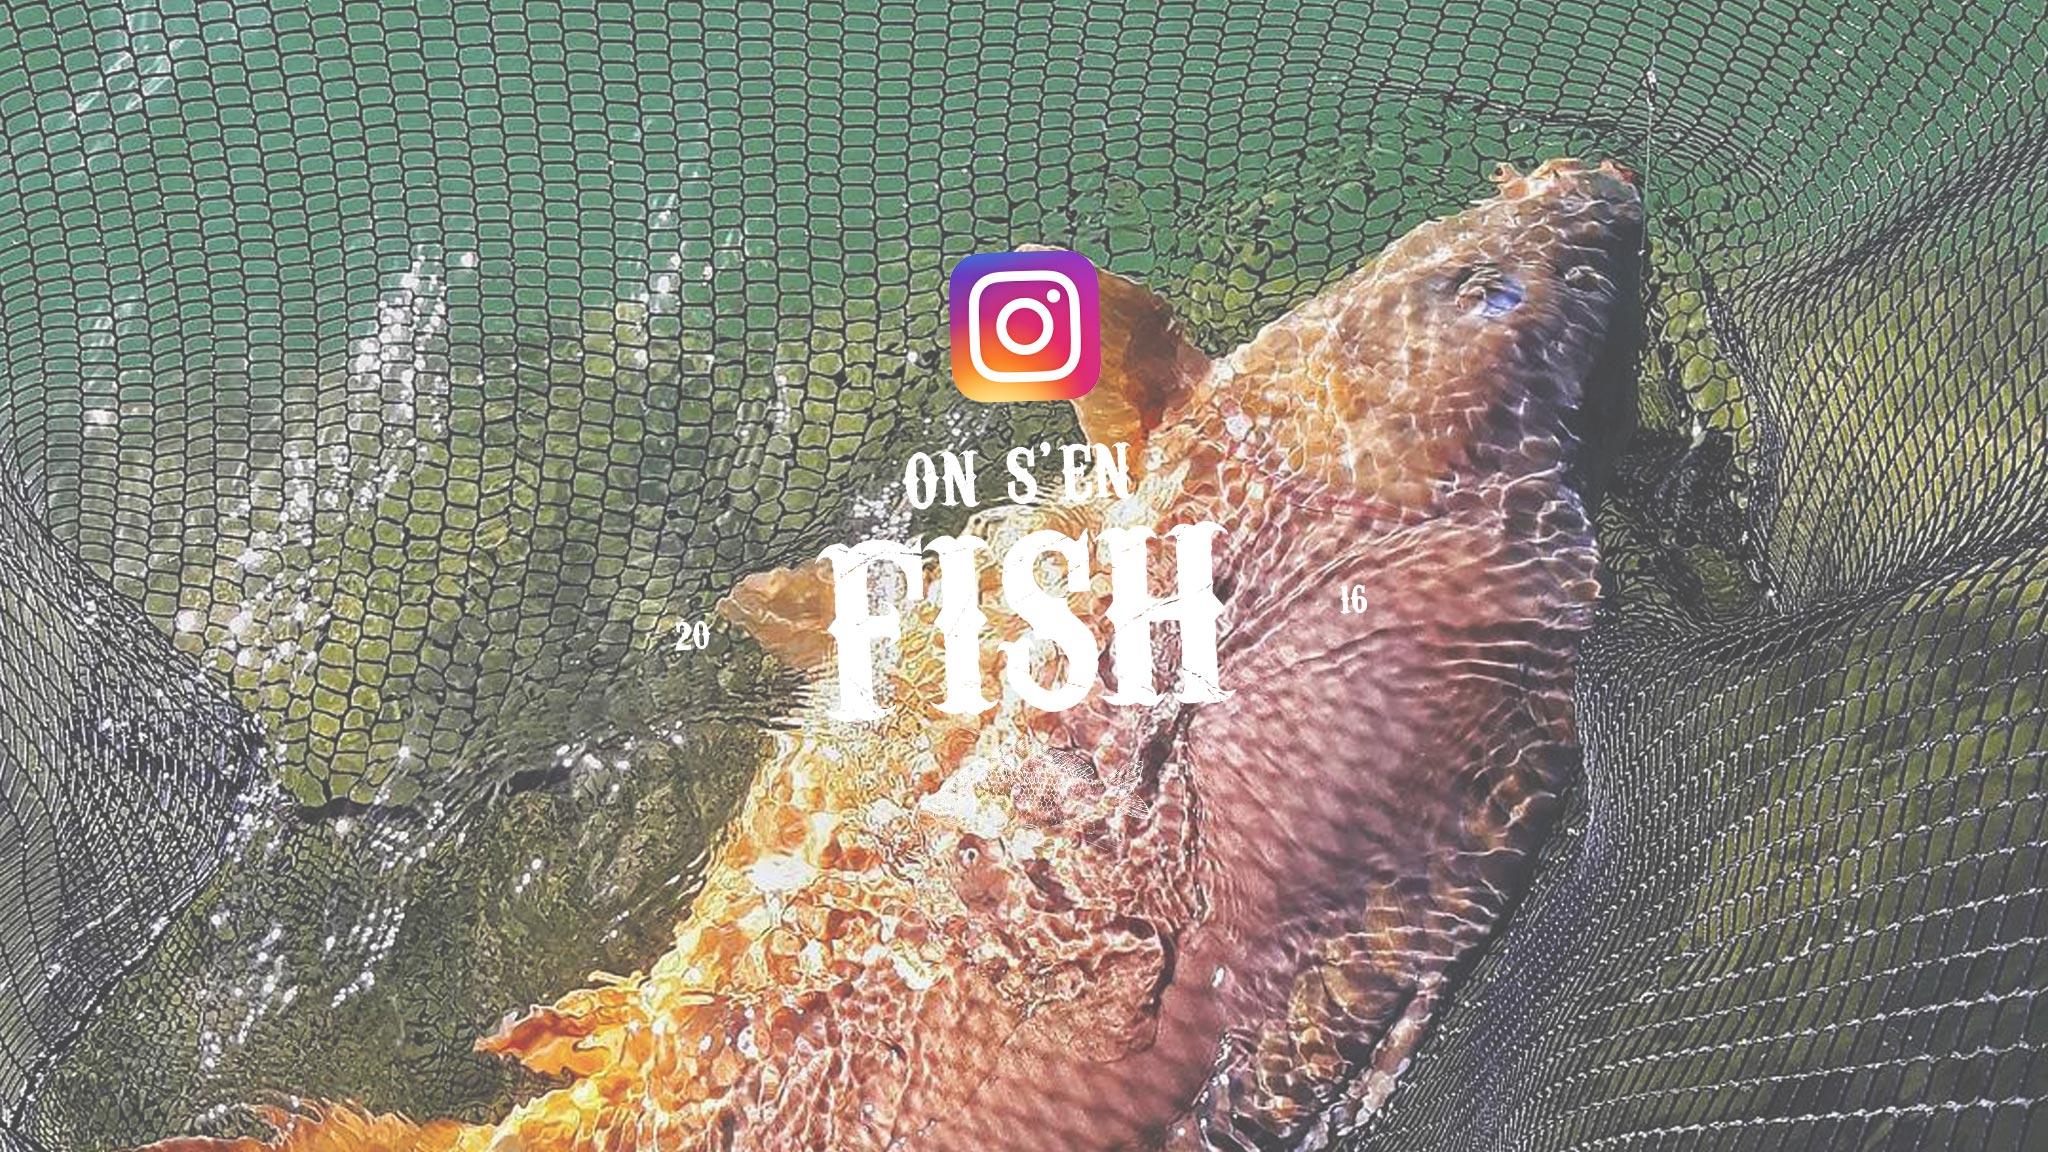 on-s-en-fish-header-carpstagram-16-best-of-peche-carpe-instagram